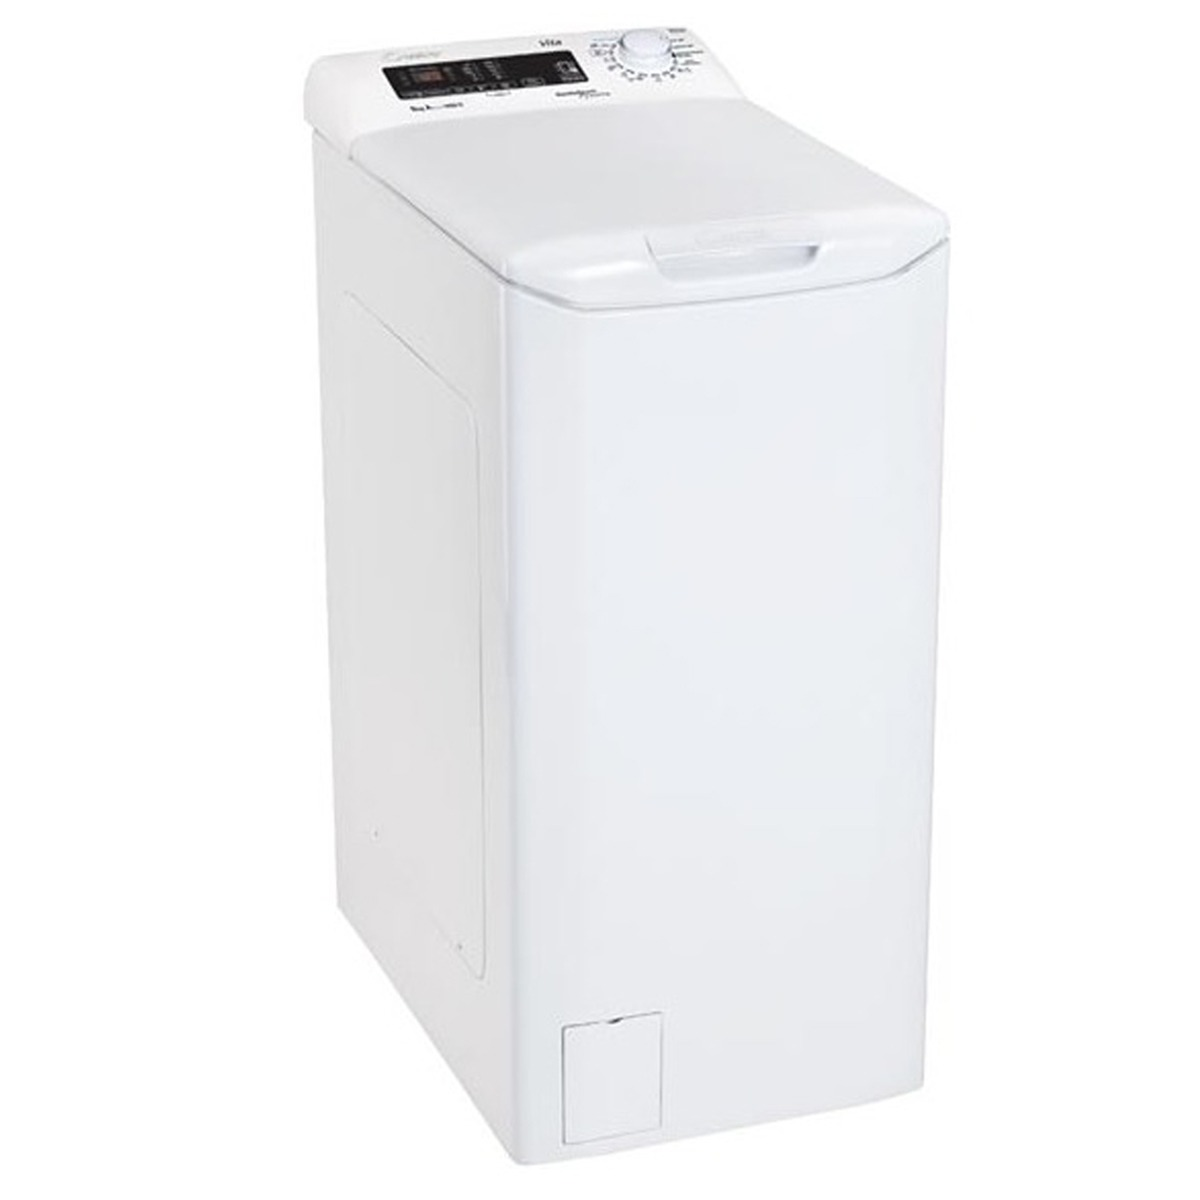 Candy CVST G384DM-S wasmachine bovenlader